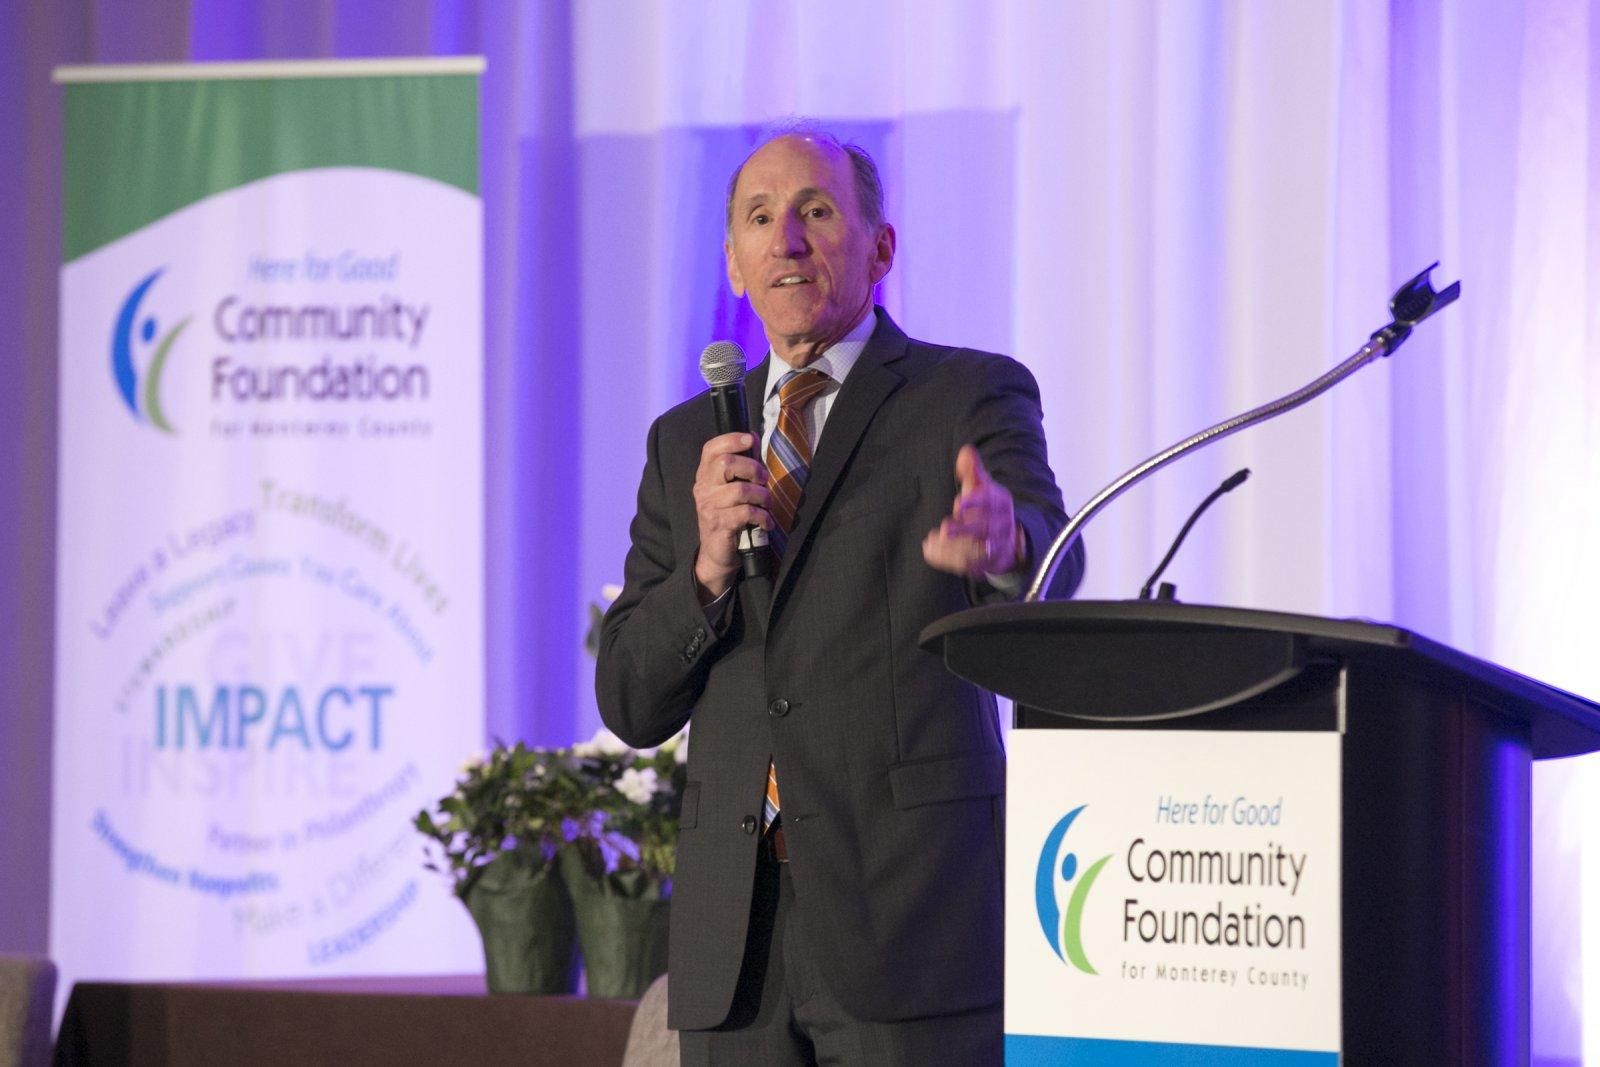 Dan Baldwin CFMC President/CEO